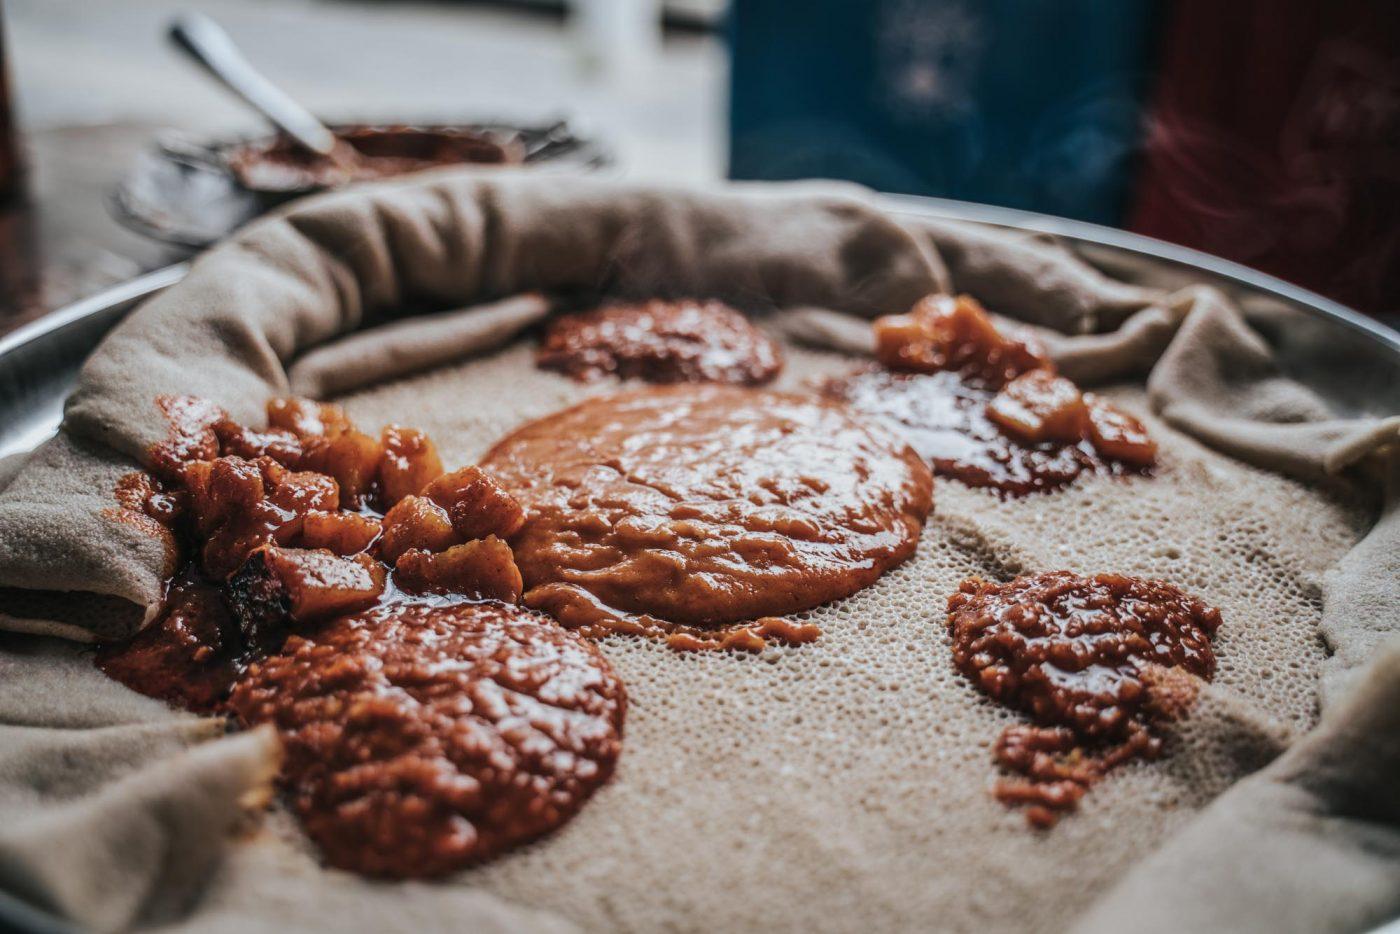 Vegan aka fasting meal in Ethiopia